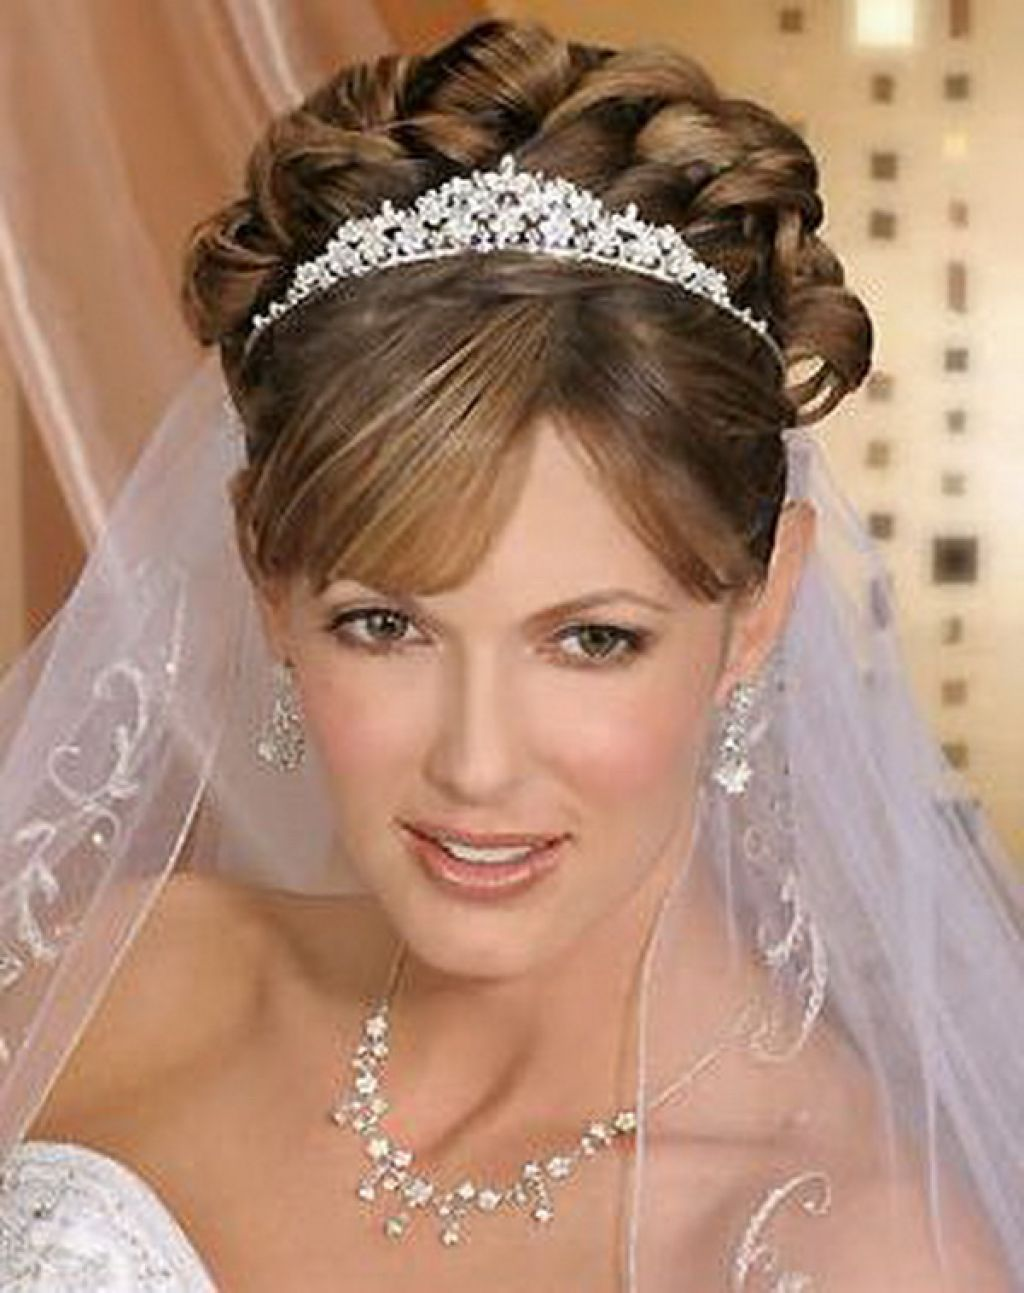 Tiara casamento penteados idéias para noivas